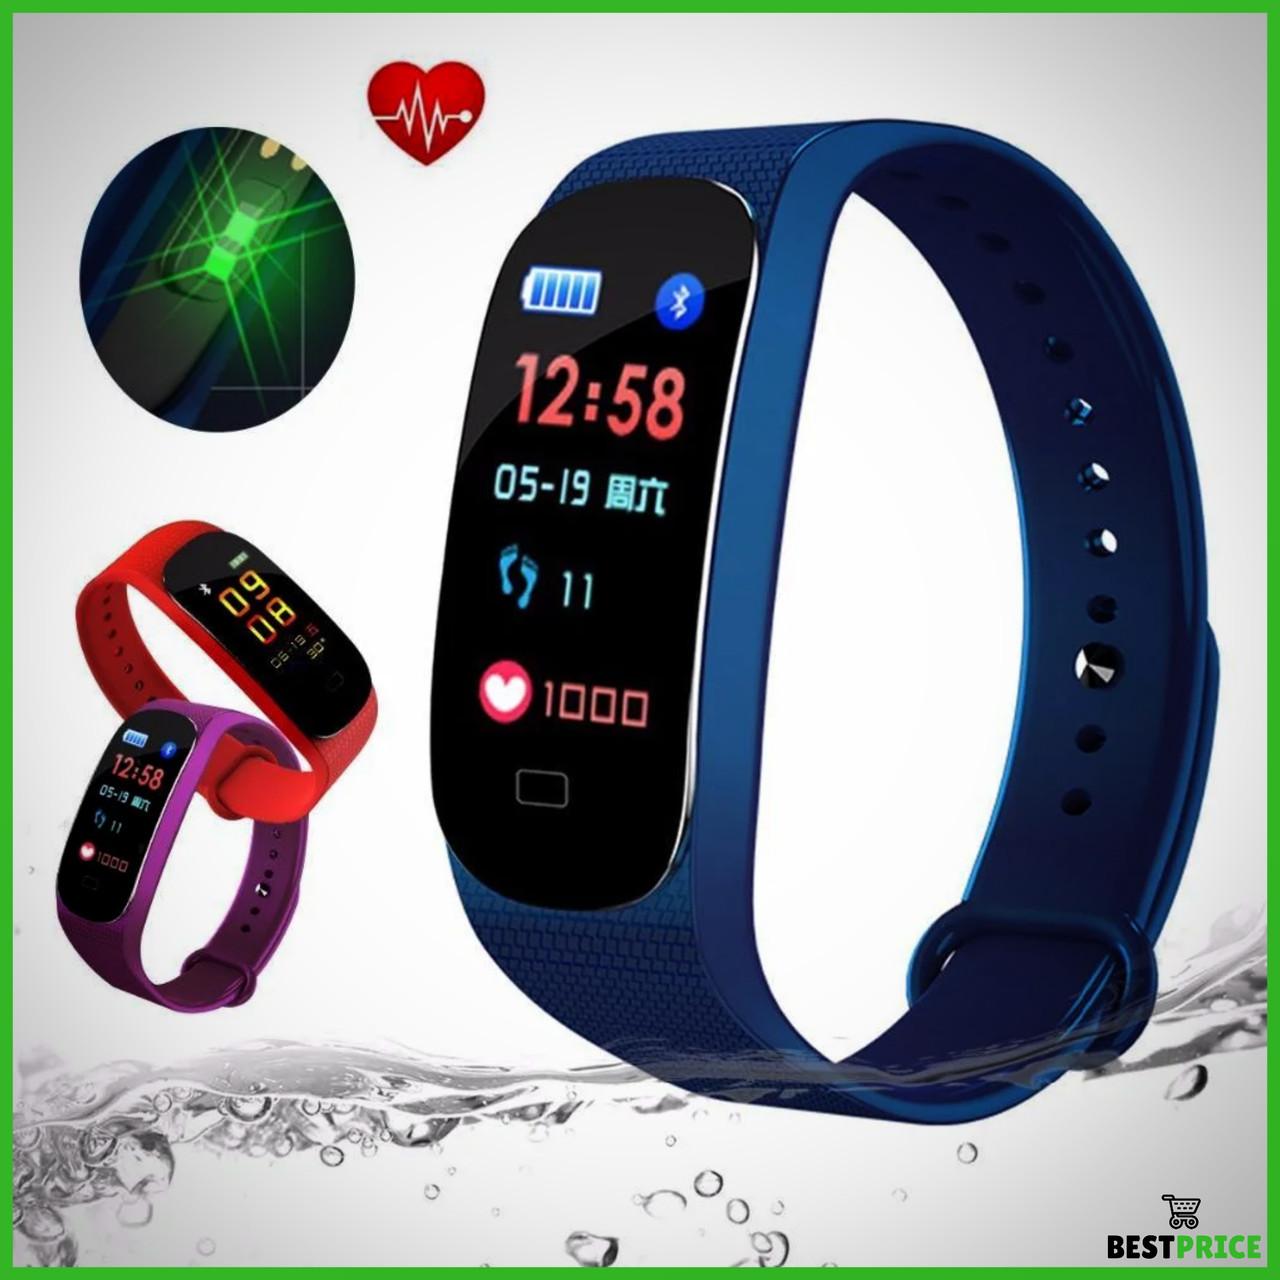 Фитнес браслет M5 Band Smart Watch Bluetooth 4.2, шагомер, фитнес трекер, пульс, монитор сна (Люкс копия )